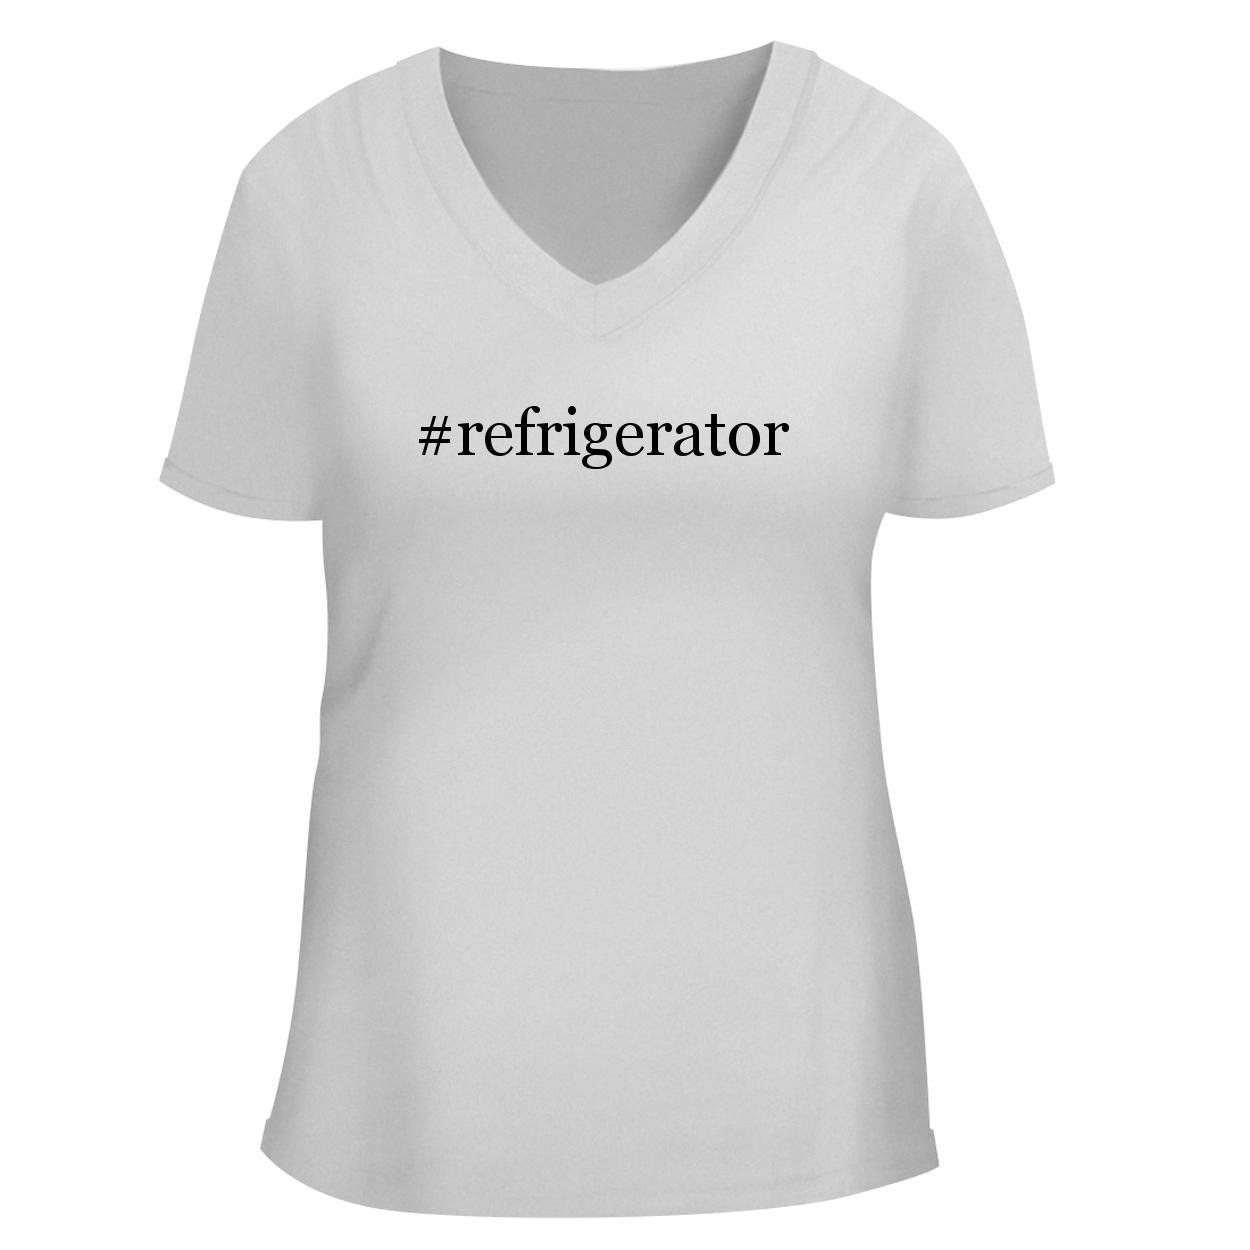 BH Cool Designs #Refrigerator - Cute Women